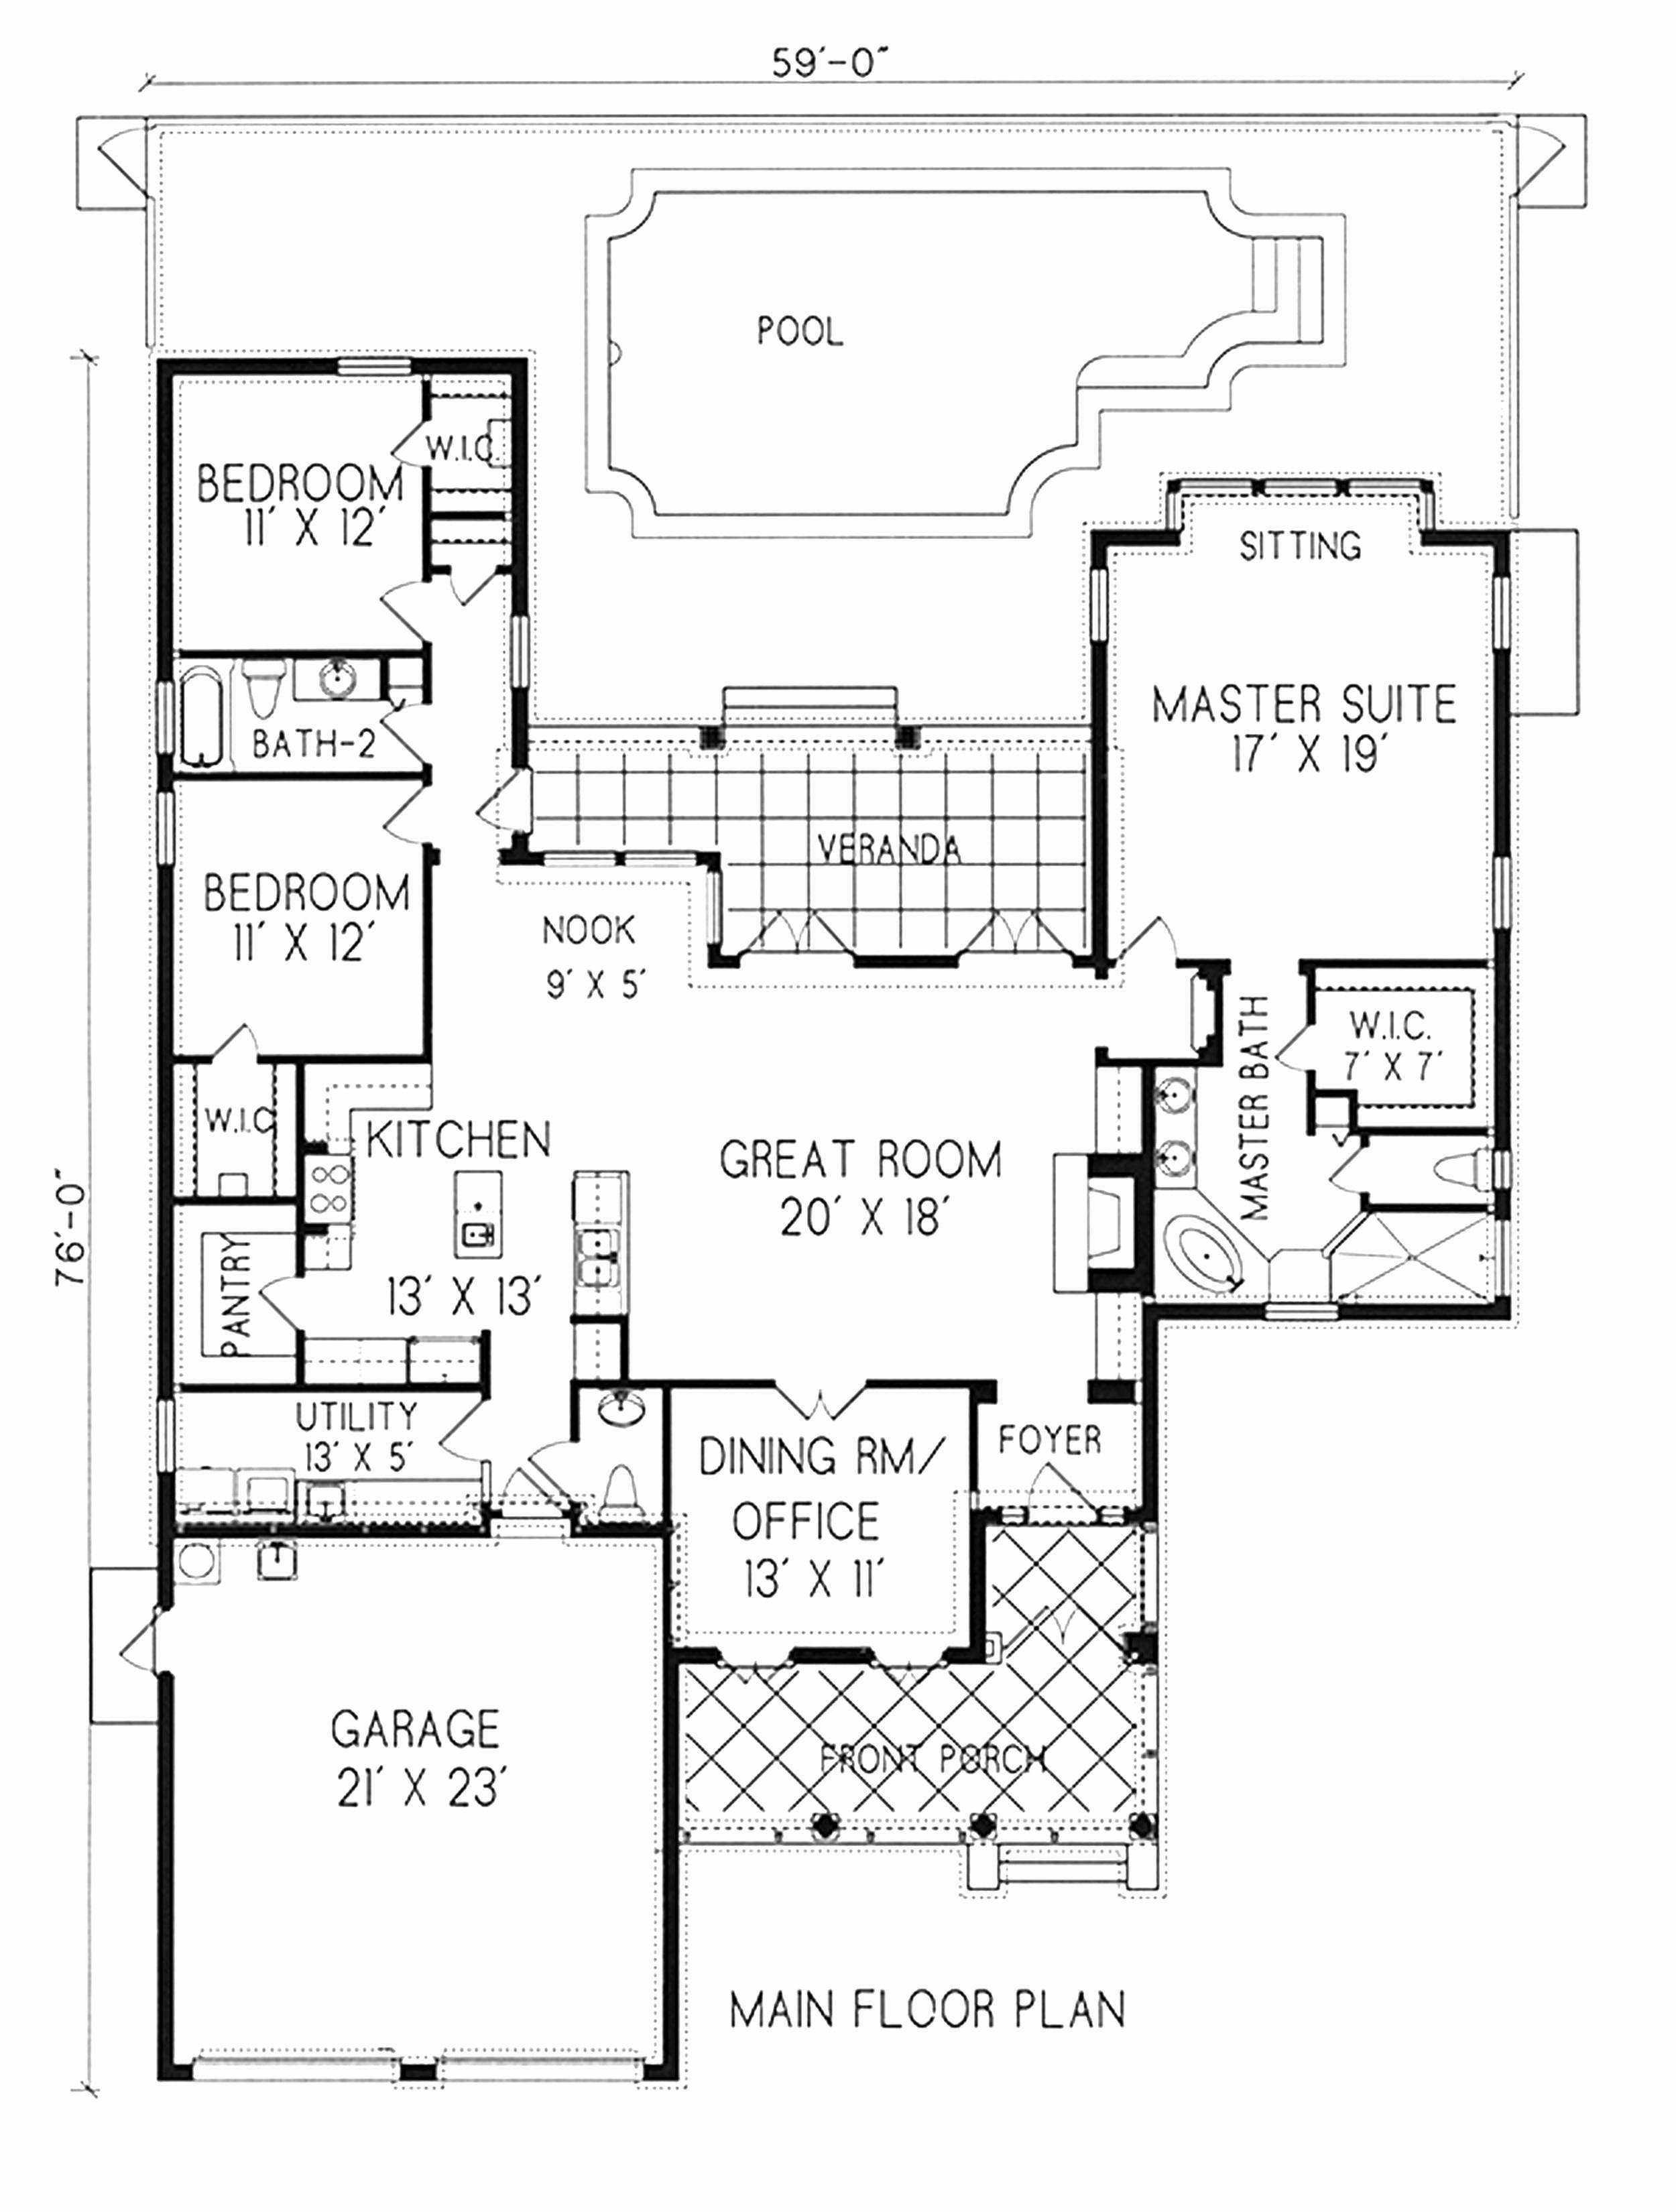 Design A Bathroom Floor Plan Online Beautiful House Plans Open Floor House Plans Colonial House Plans